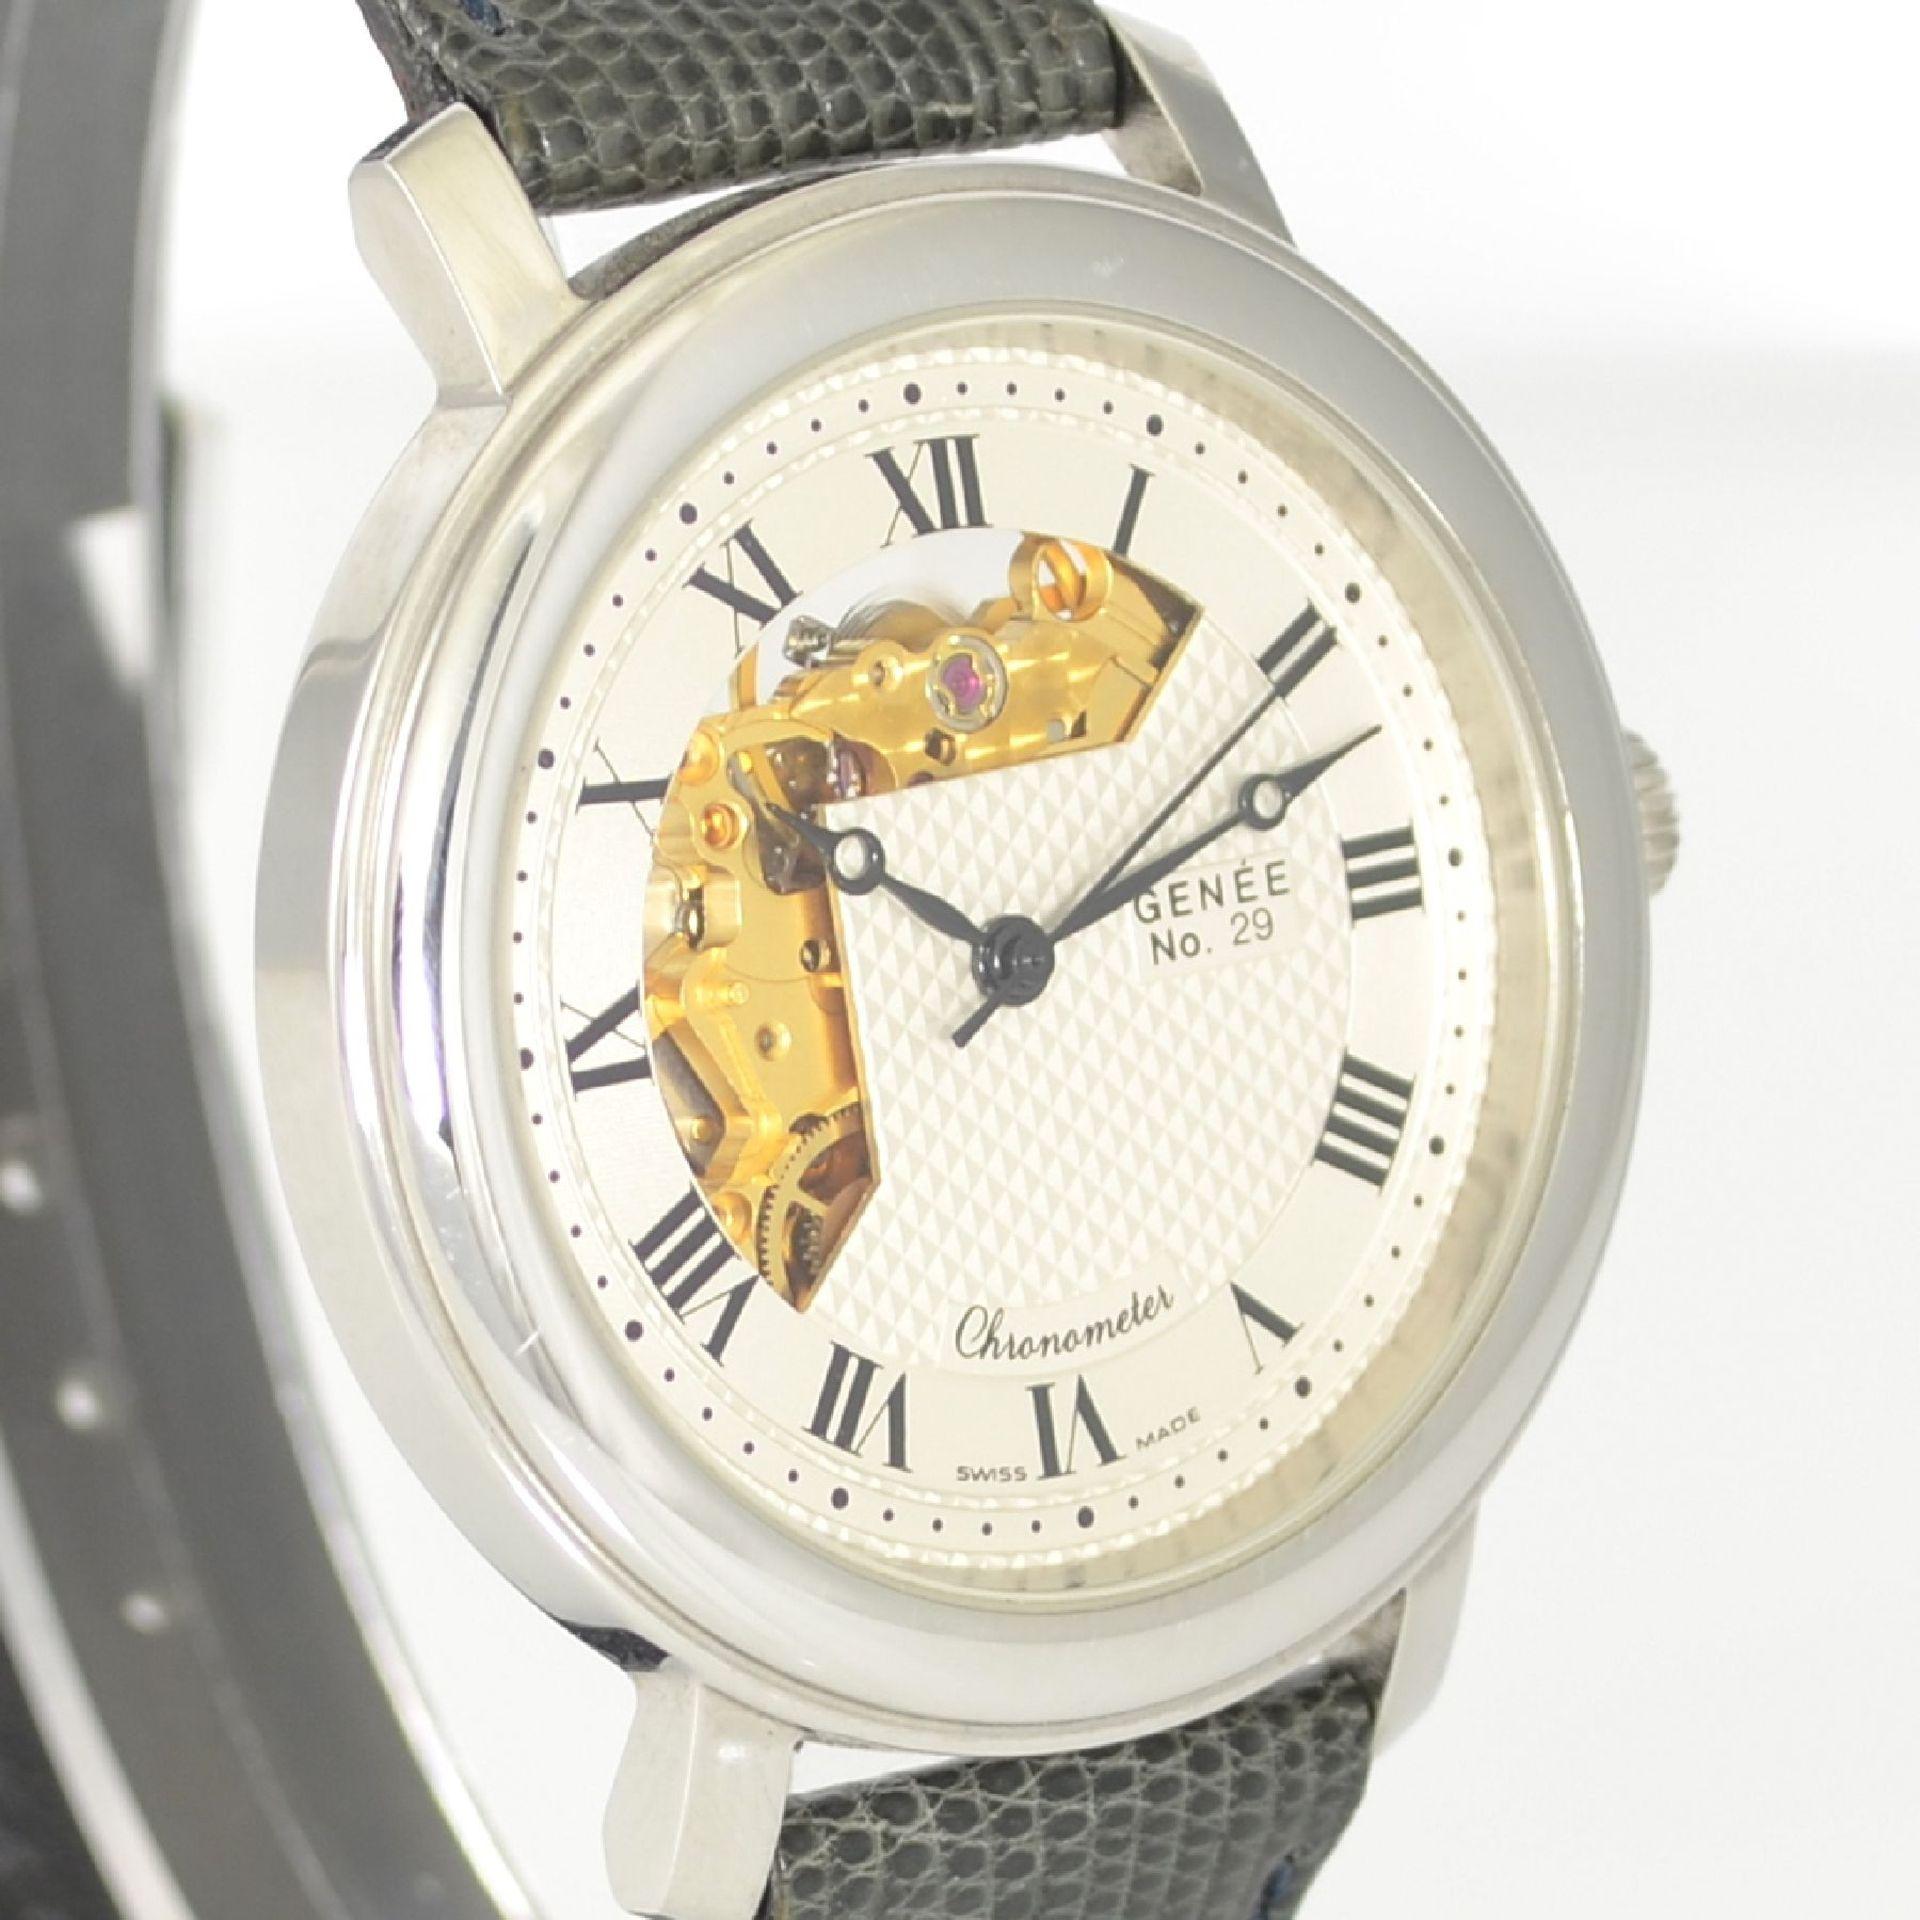 GENÉE No. 29 Chronometer-Herrenarmbanduhr in Stahl, Schweiz lt. beiliegendem Chronometerzertifikat - Bild 4 aus 8